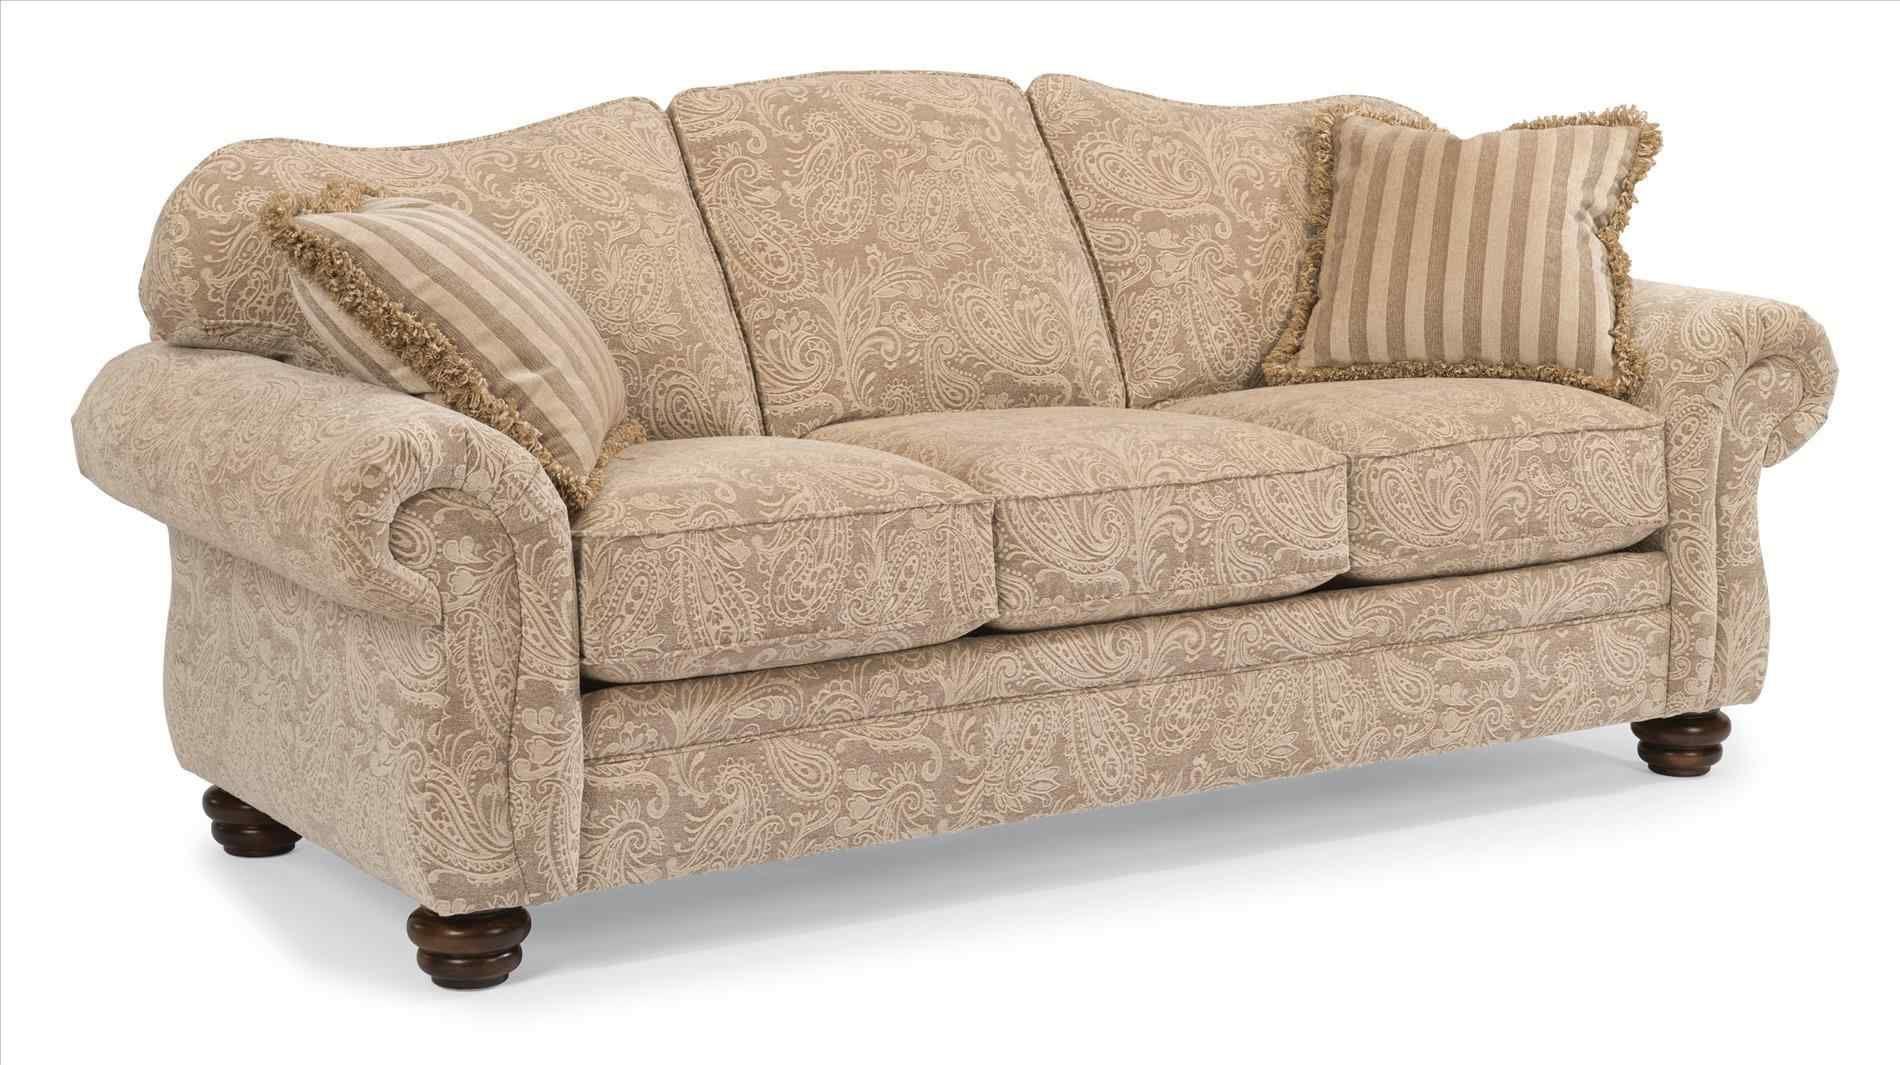 flexsteel sleeper sofa for rv s countryside interiors hemshaw